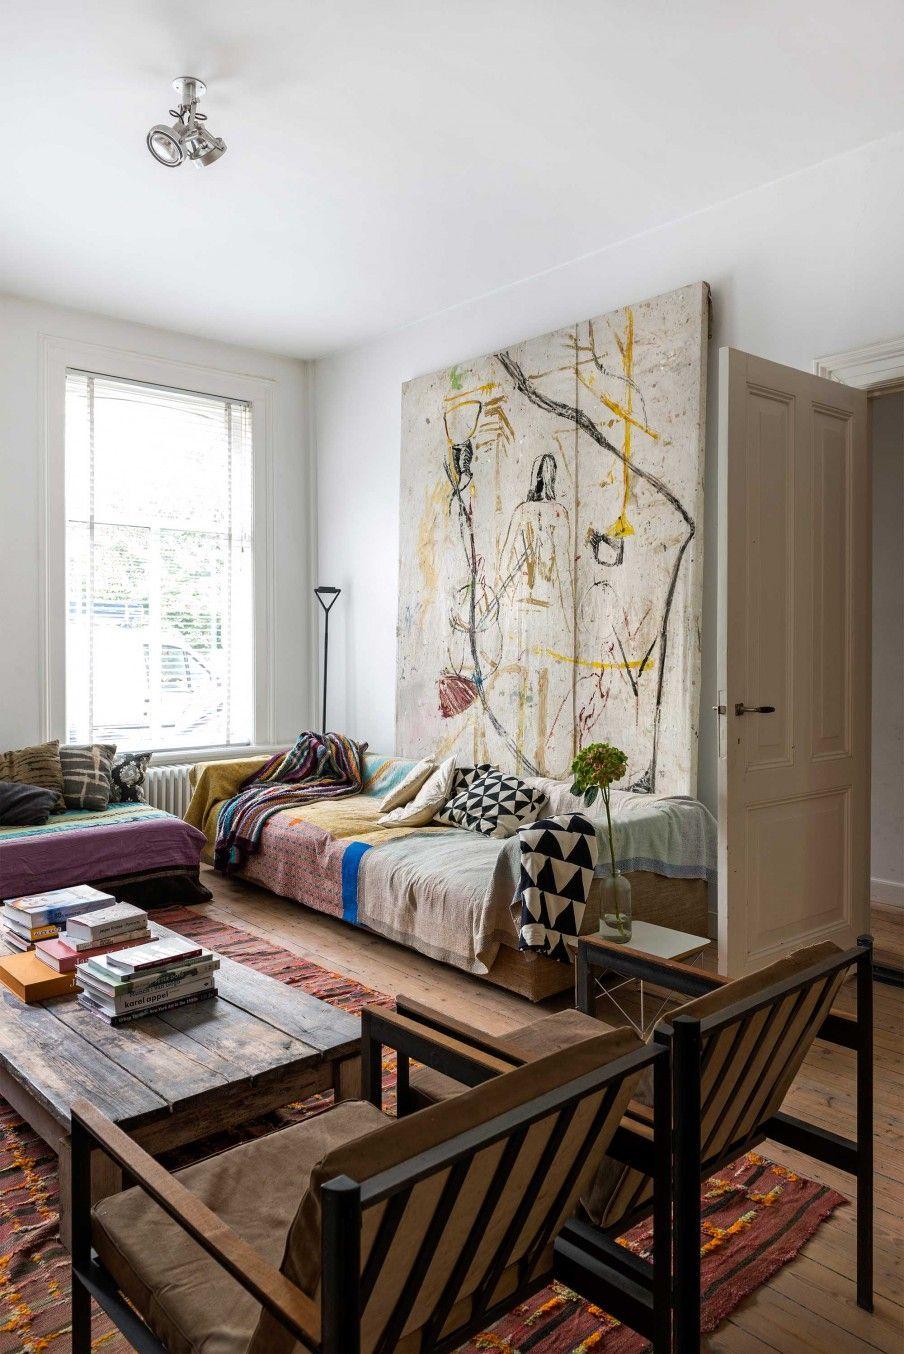 wandkleed in woonkamer | tapestry at livingroom | vtwonen 10-2016 ...